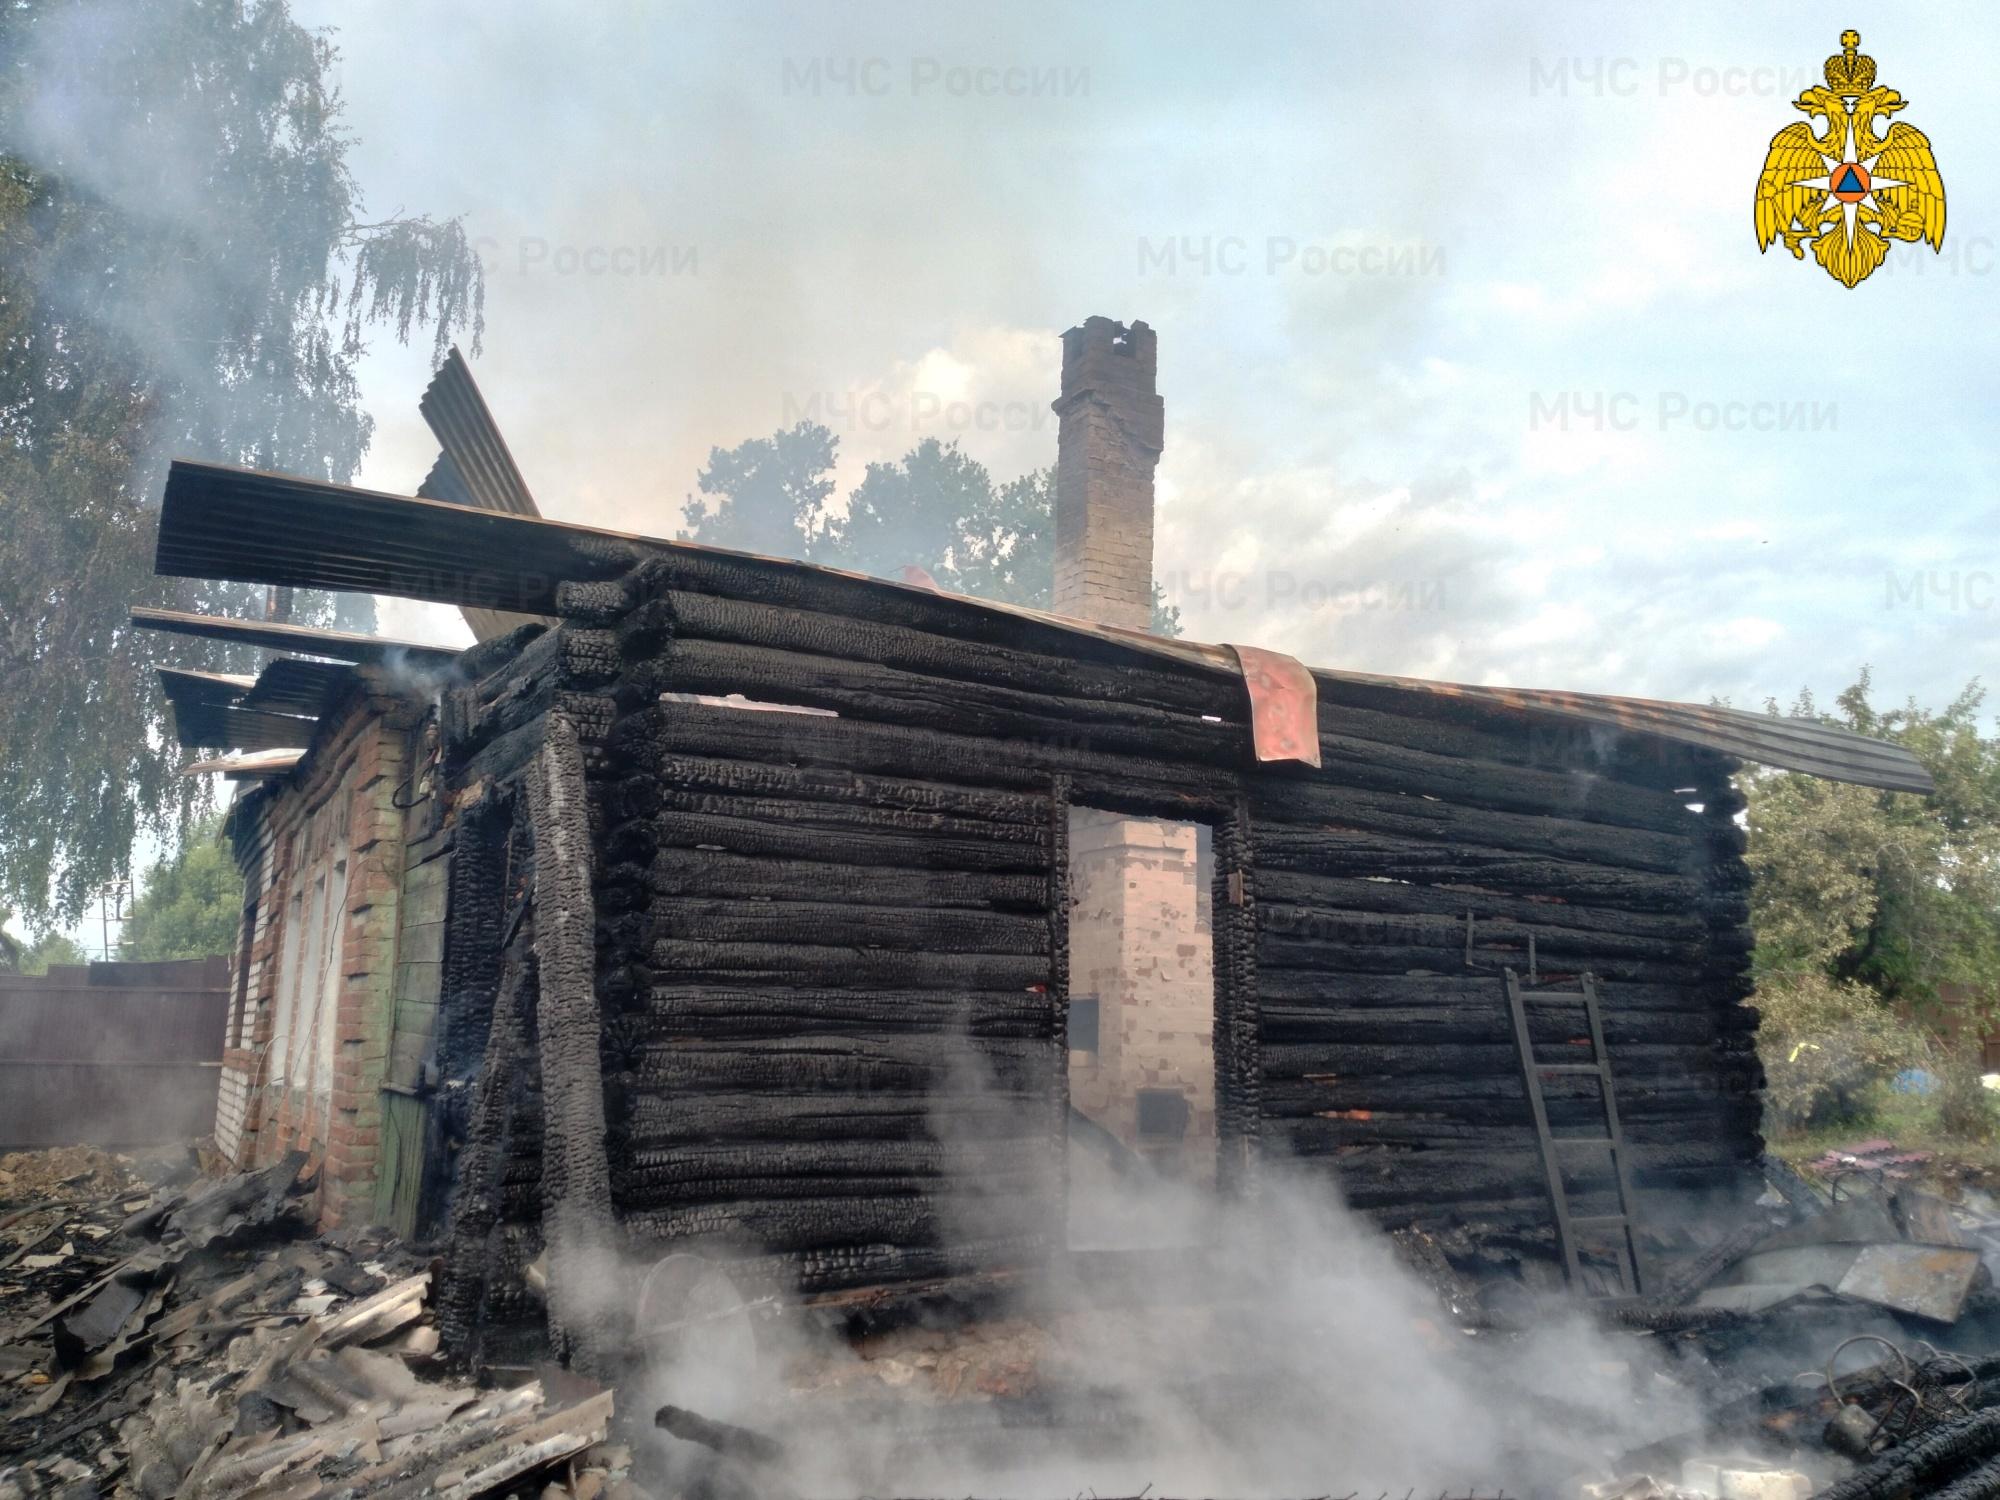 Пожар в Тарусском районе, д. Кольцово, ул. Московская